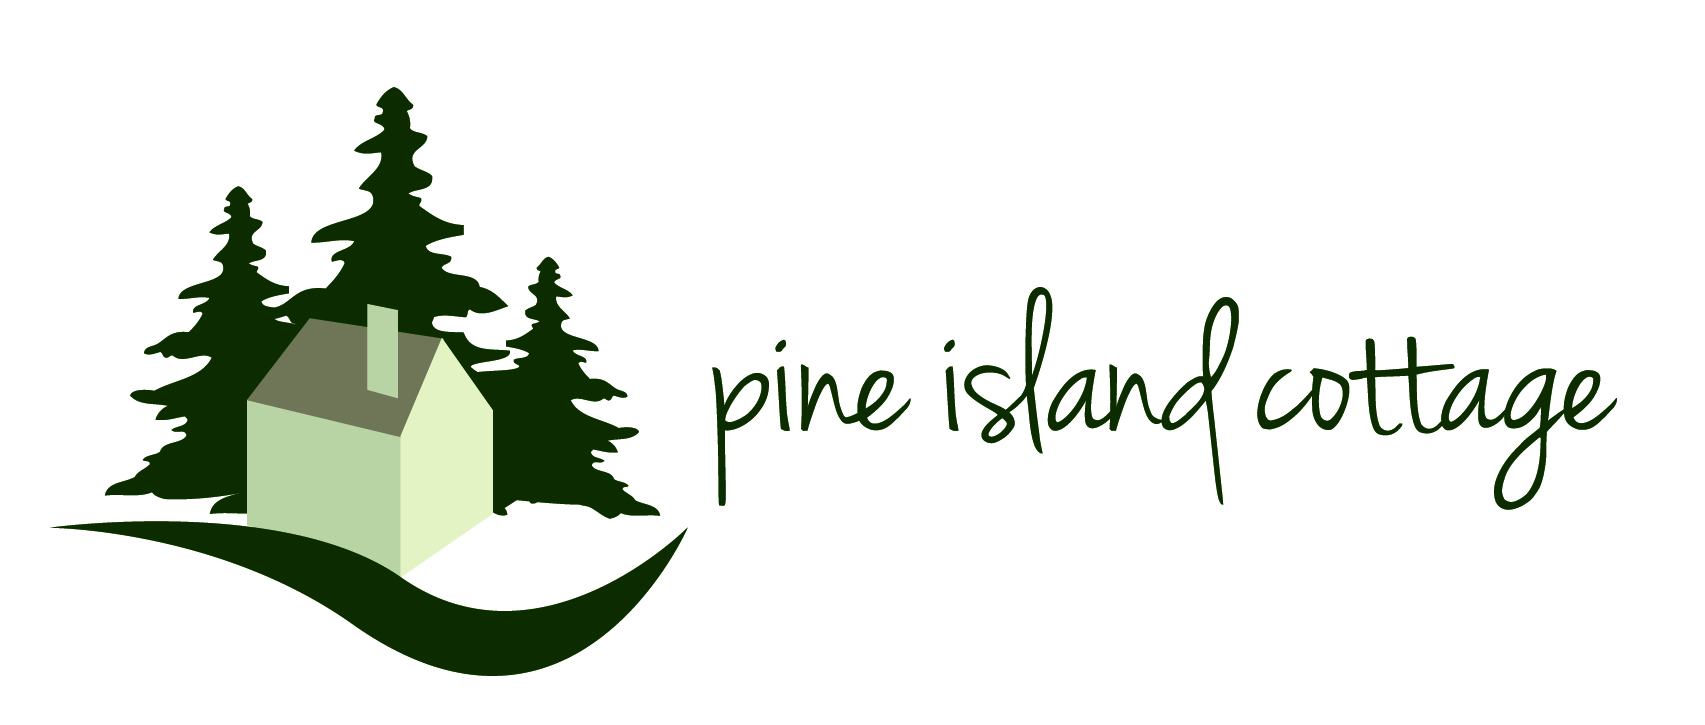 pine island cottage